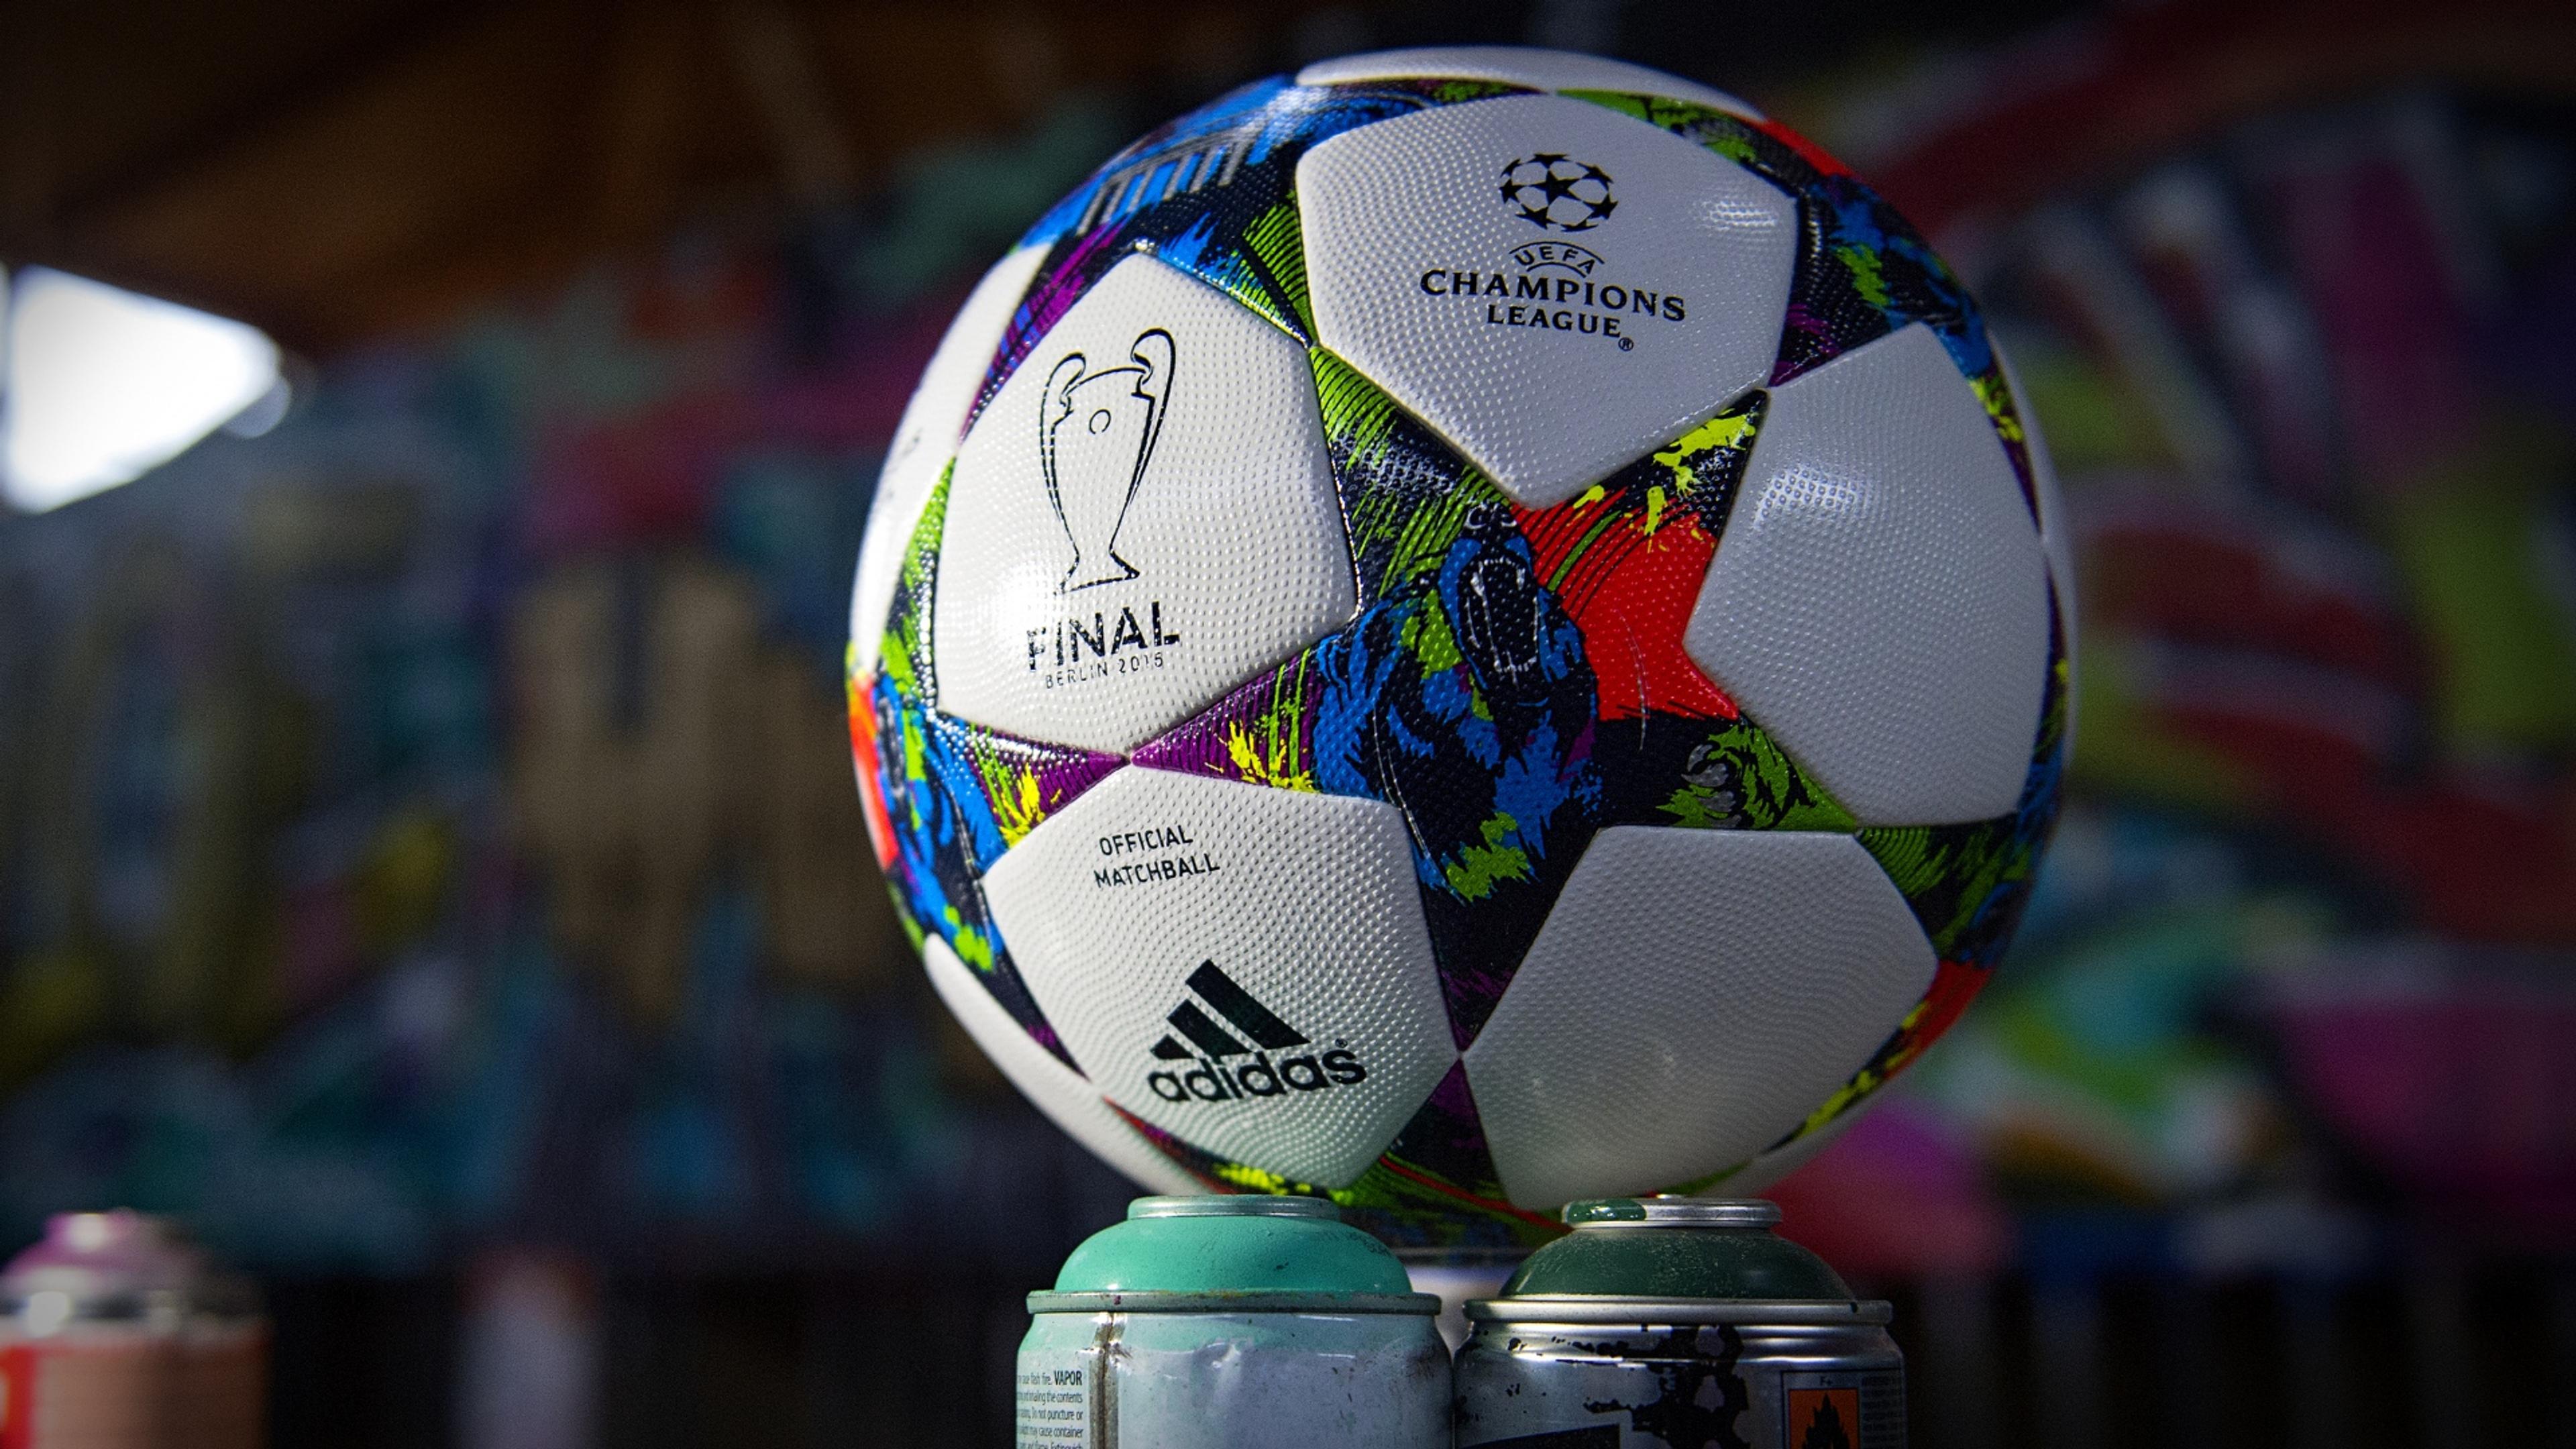 Uefa Champions League Ball Football Wallpaper